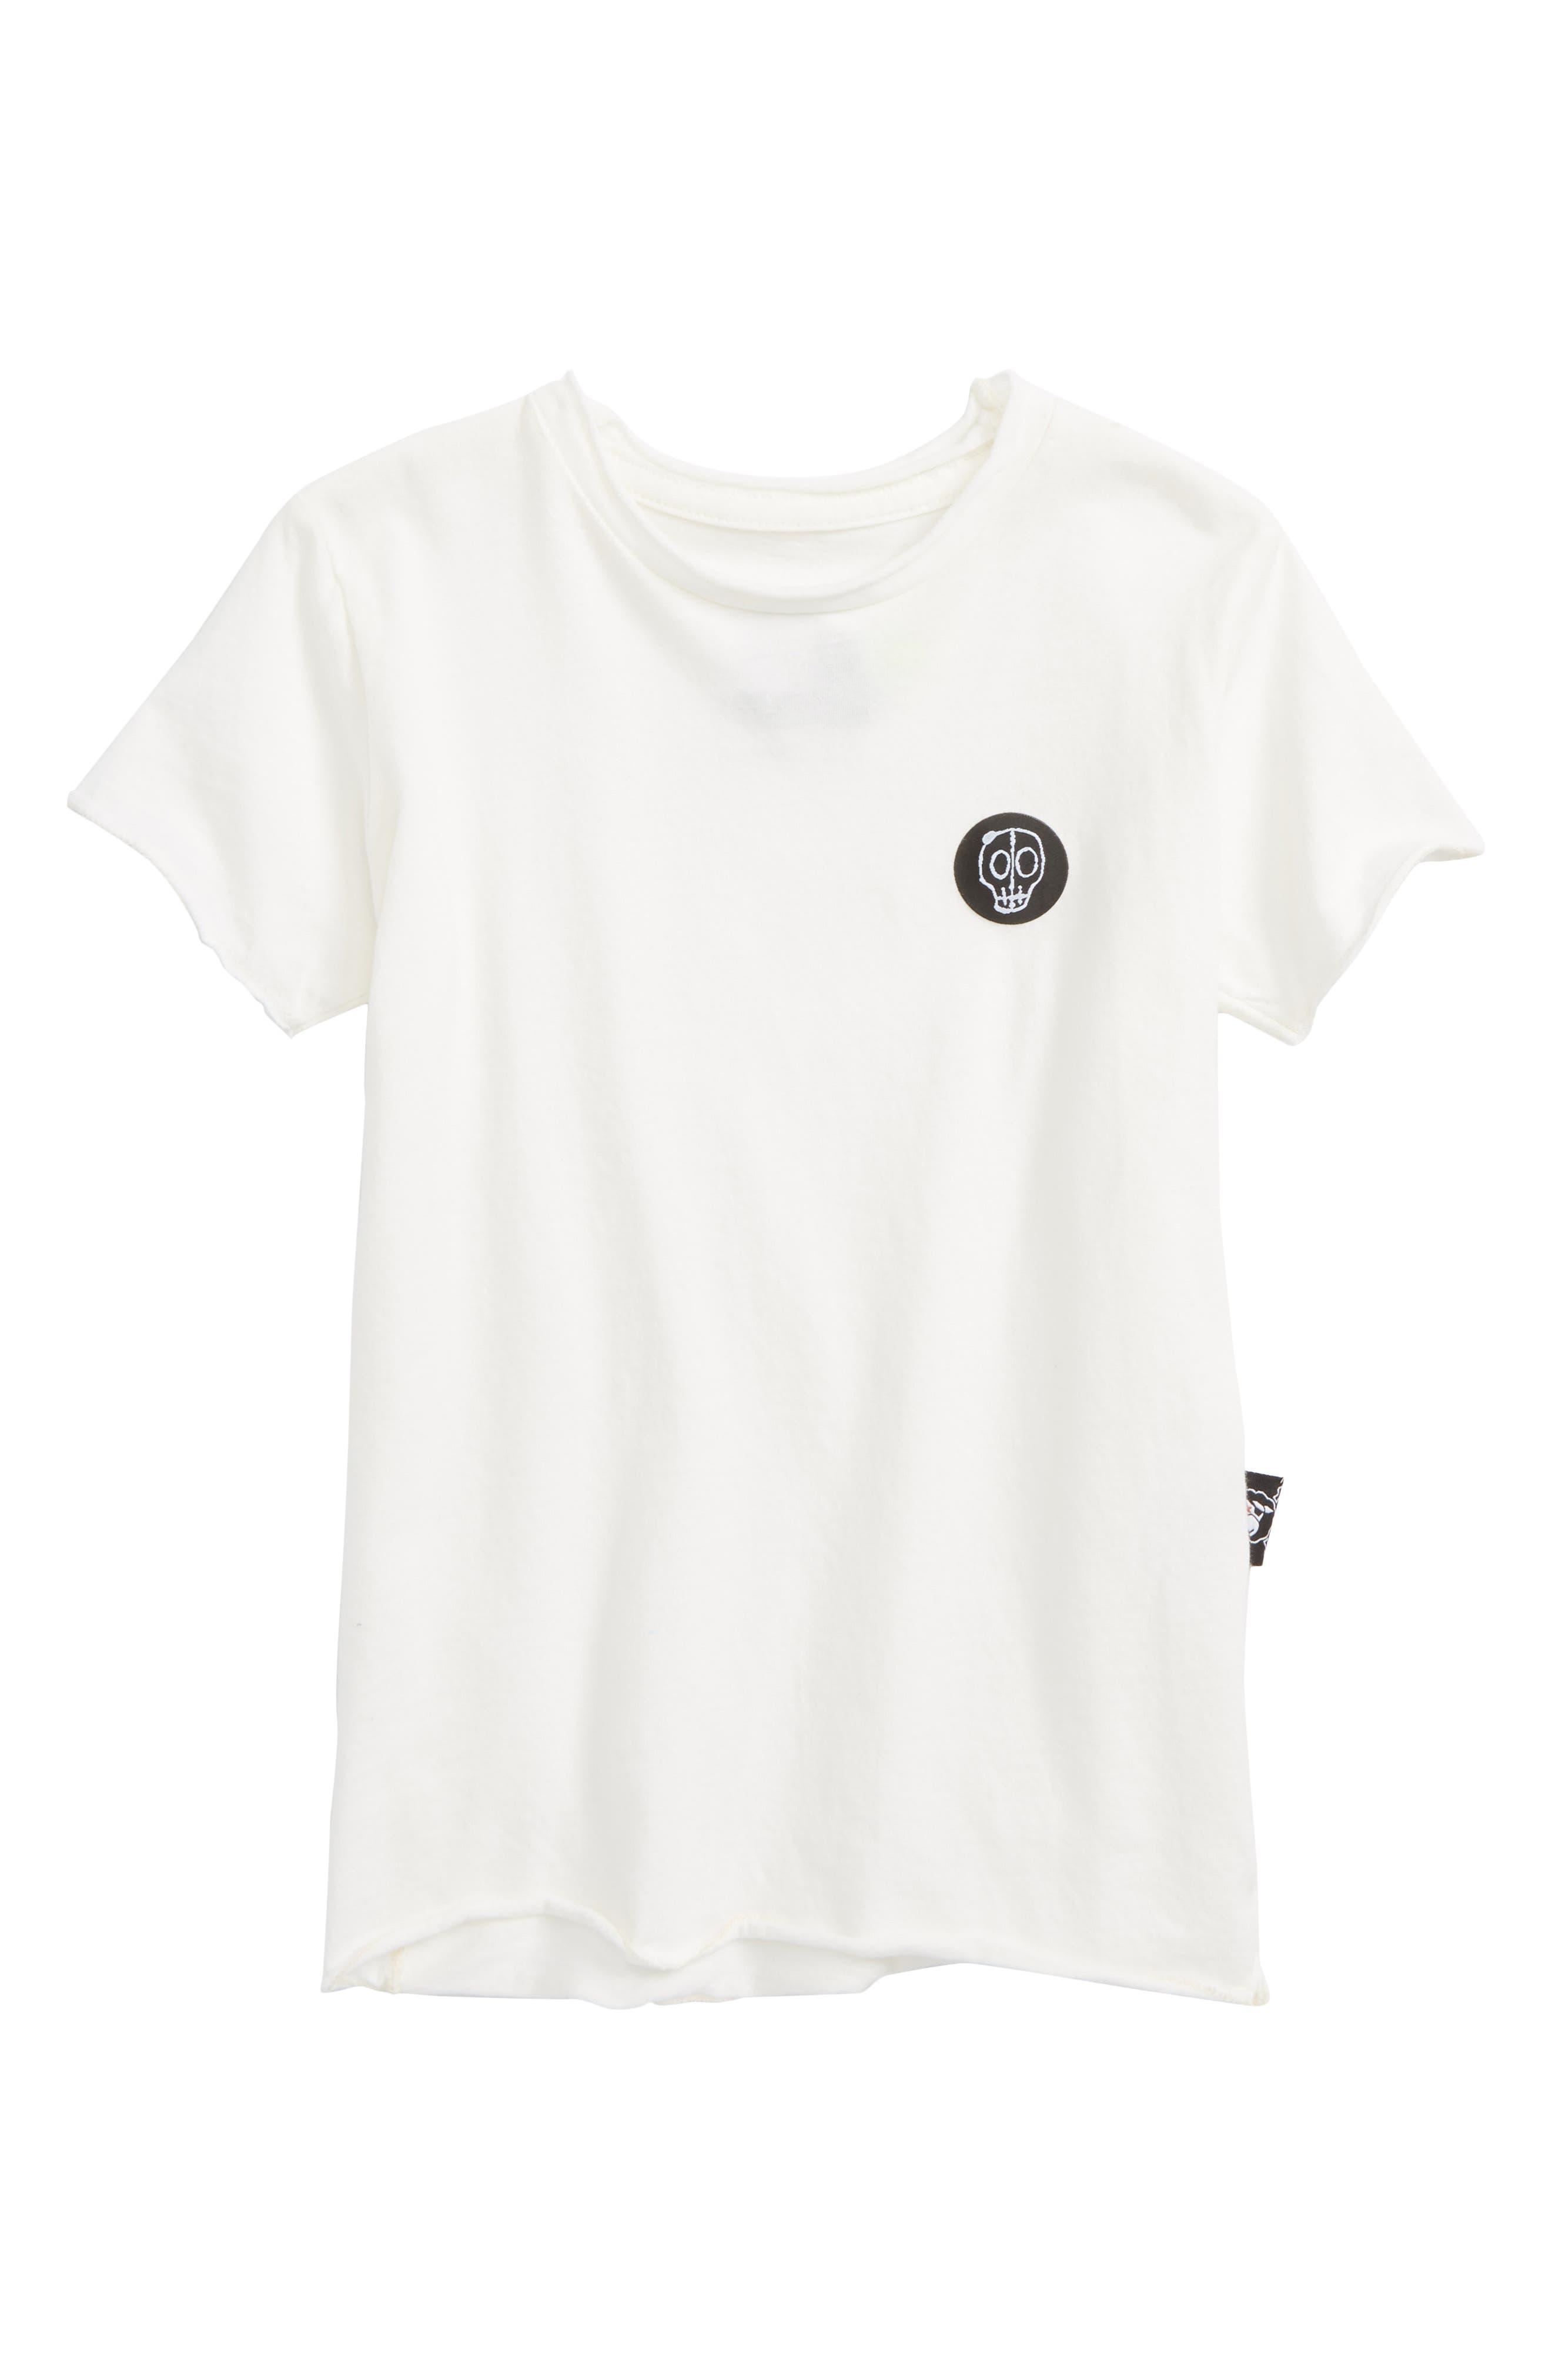 Alternate Image 1 Selected - Nununu Logo Patch T-Shirt (Toddler Boys, Little Boys & Big Boys)